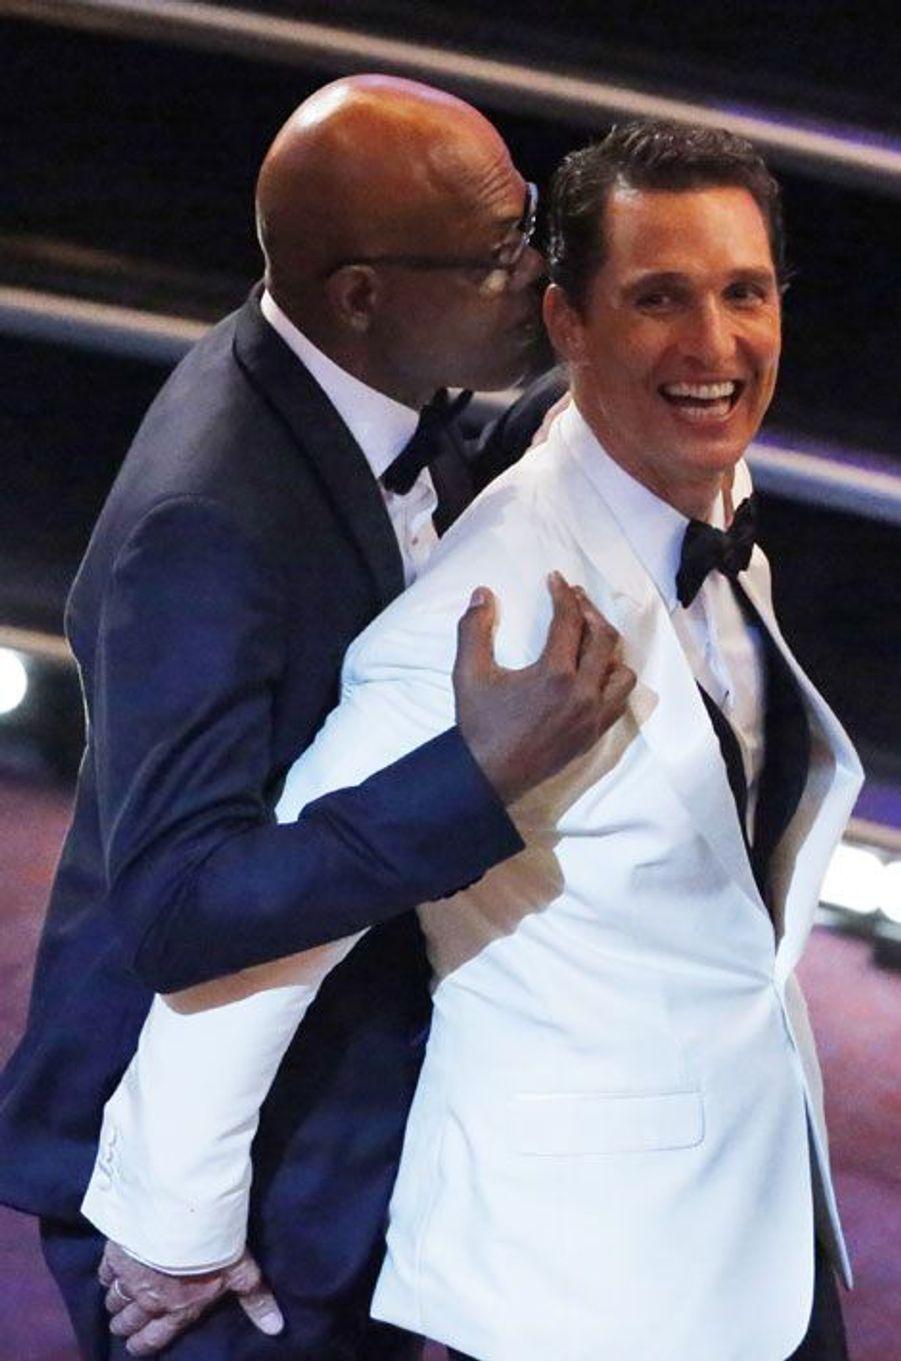 Matthew McConaughey et Samuel L. Jackson